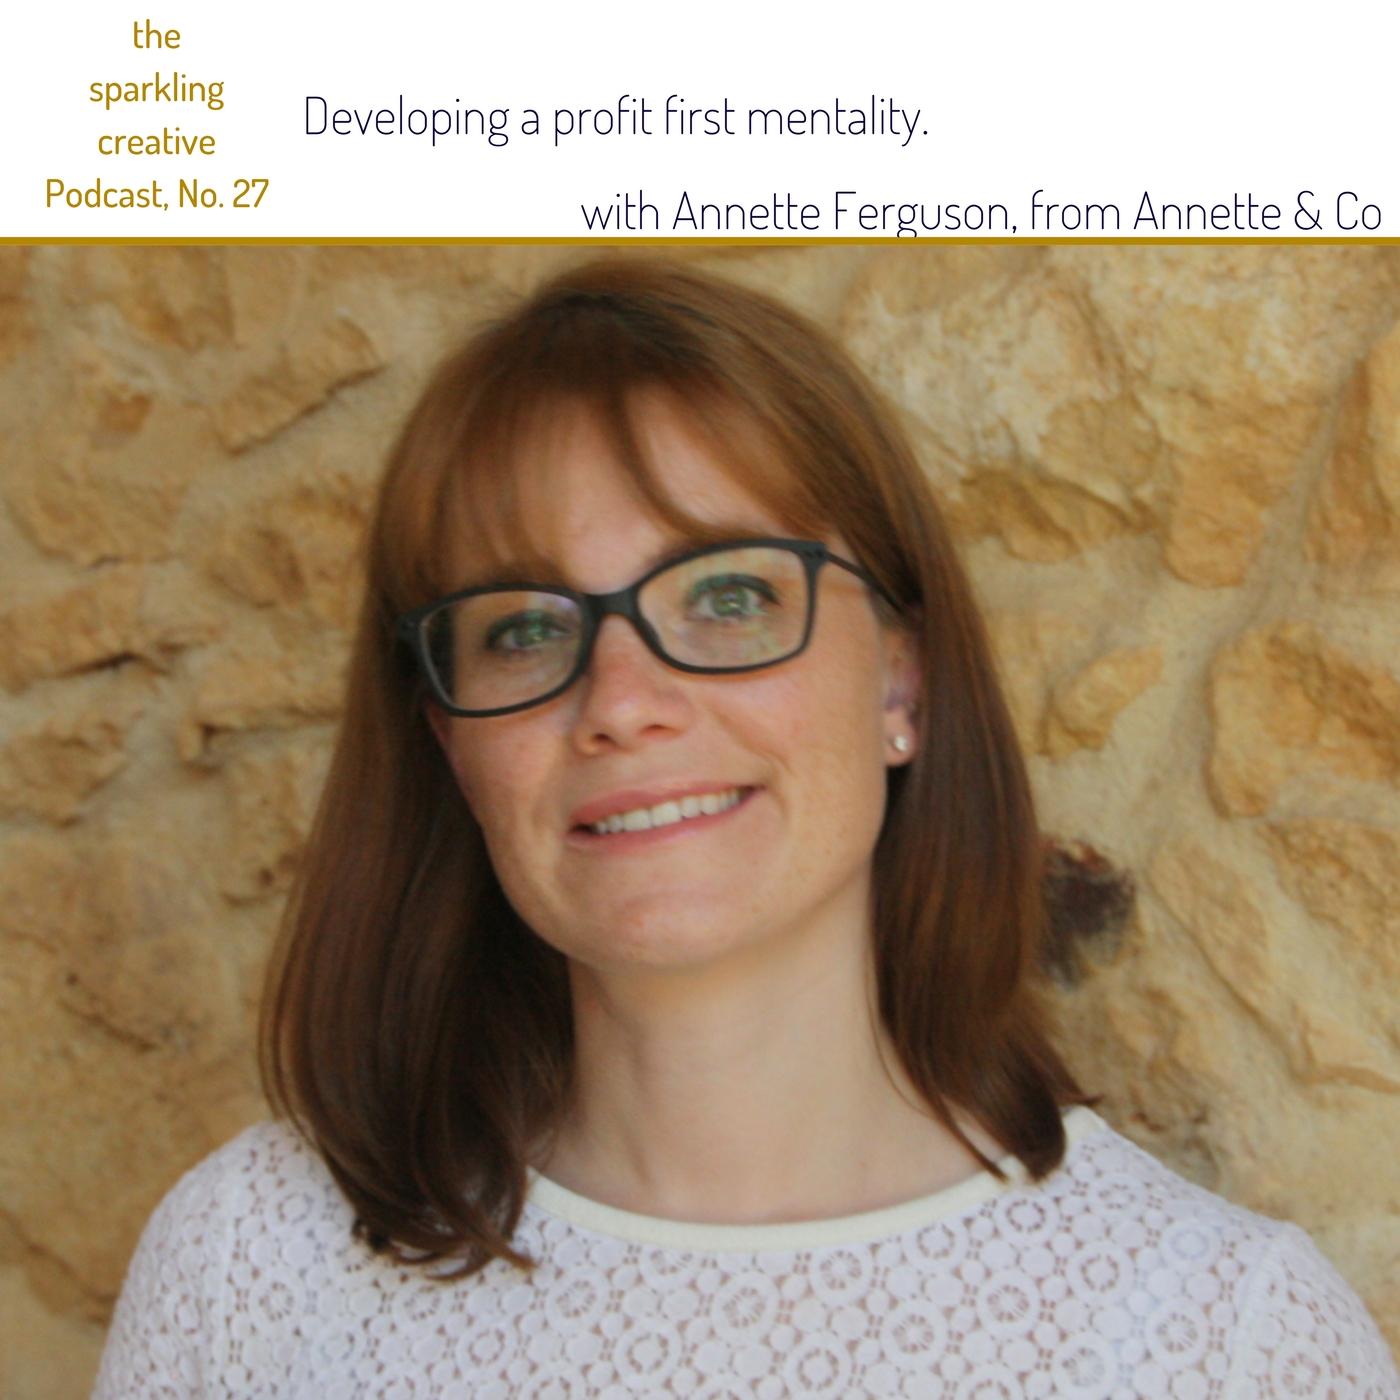 The sparkling creative Podcast Episode 27: Developing a profit first mentality. With Annette Ferguson. www.kerstinpressler.com/blog-2/episode27